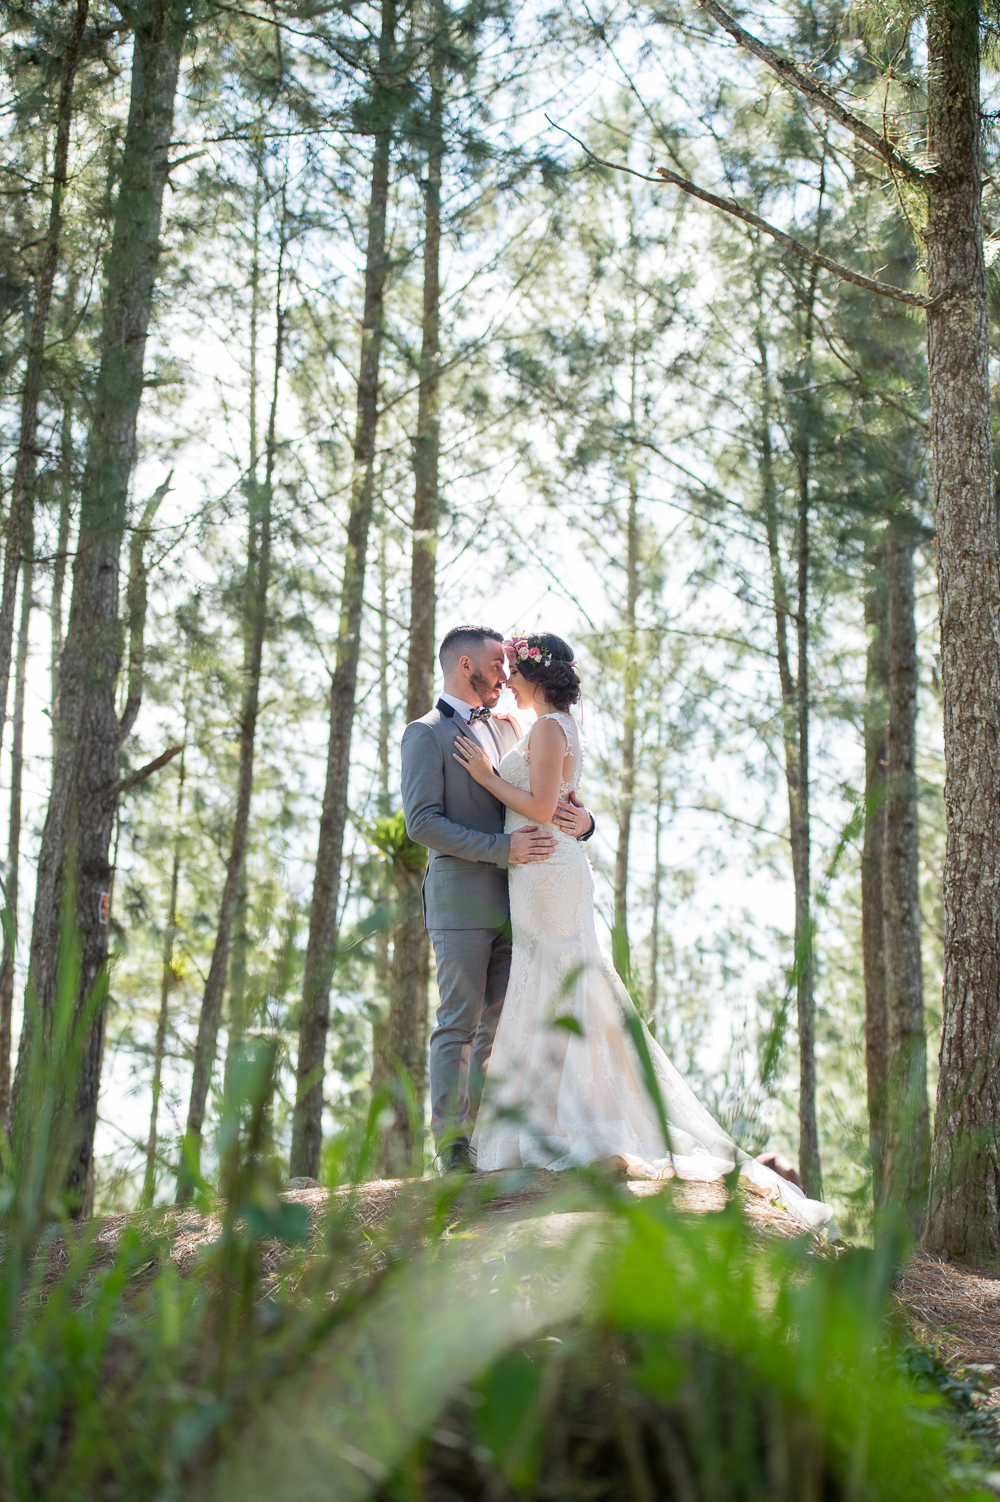 fotografia-bodas-puerto-rico-bosque-pinos-cayey-salinas-2.jpg